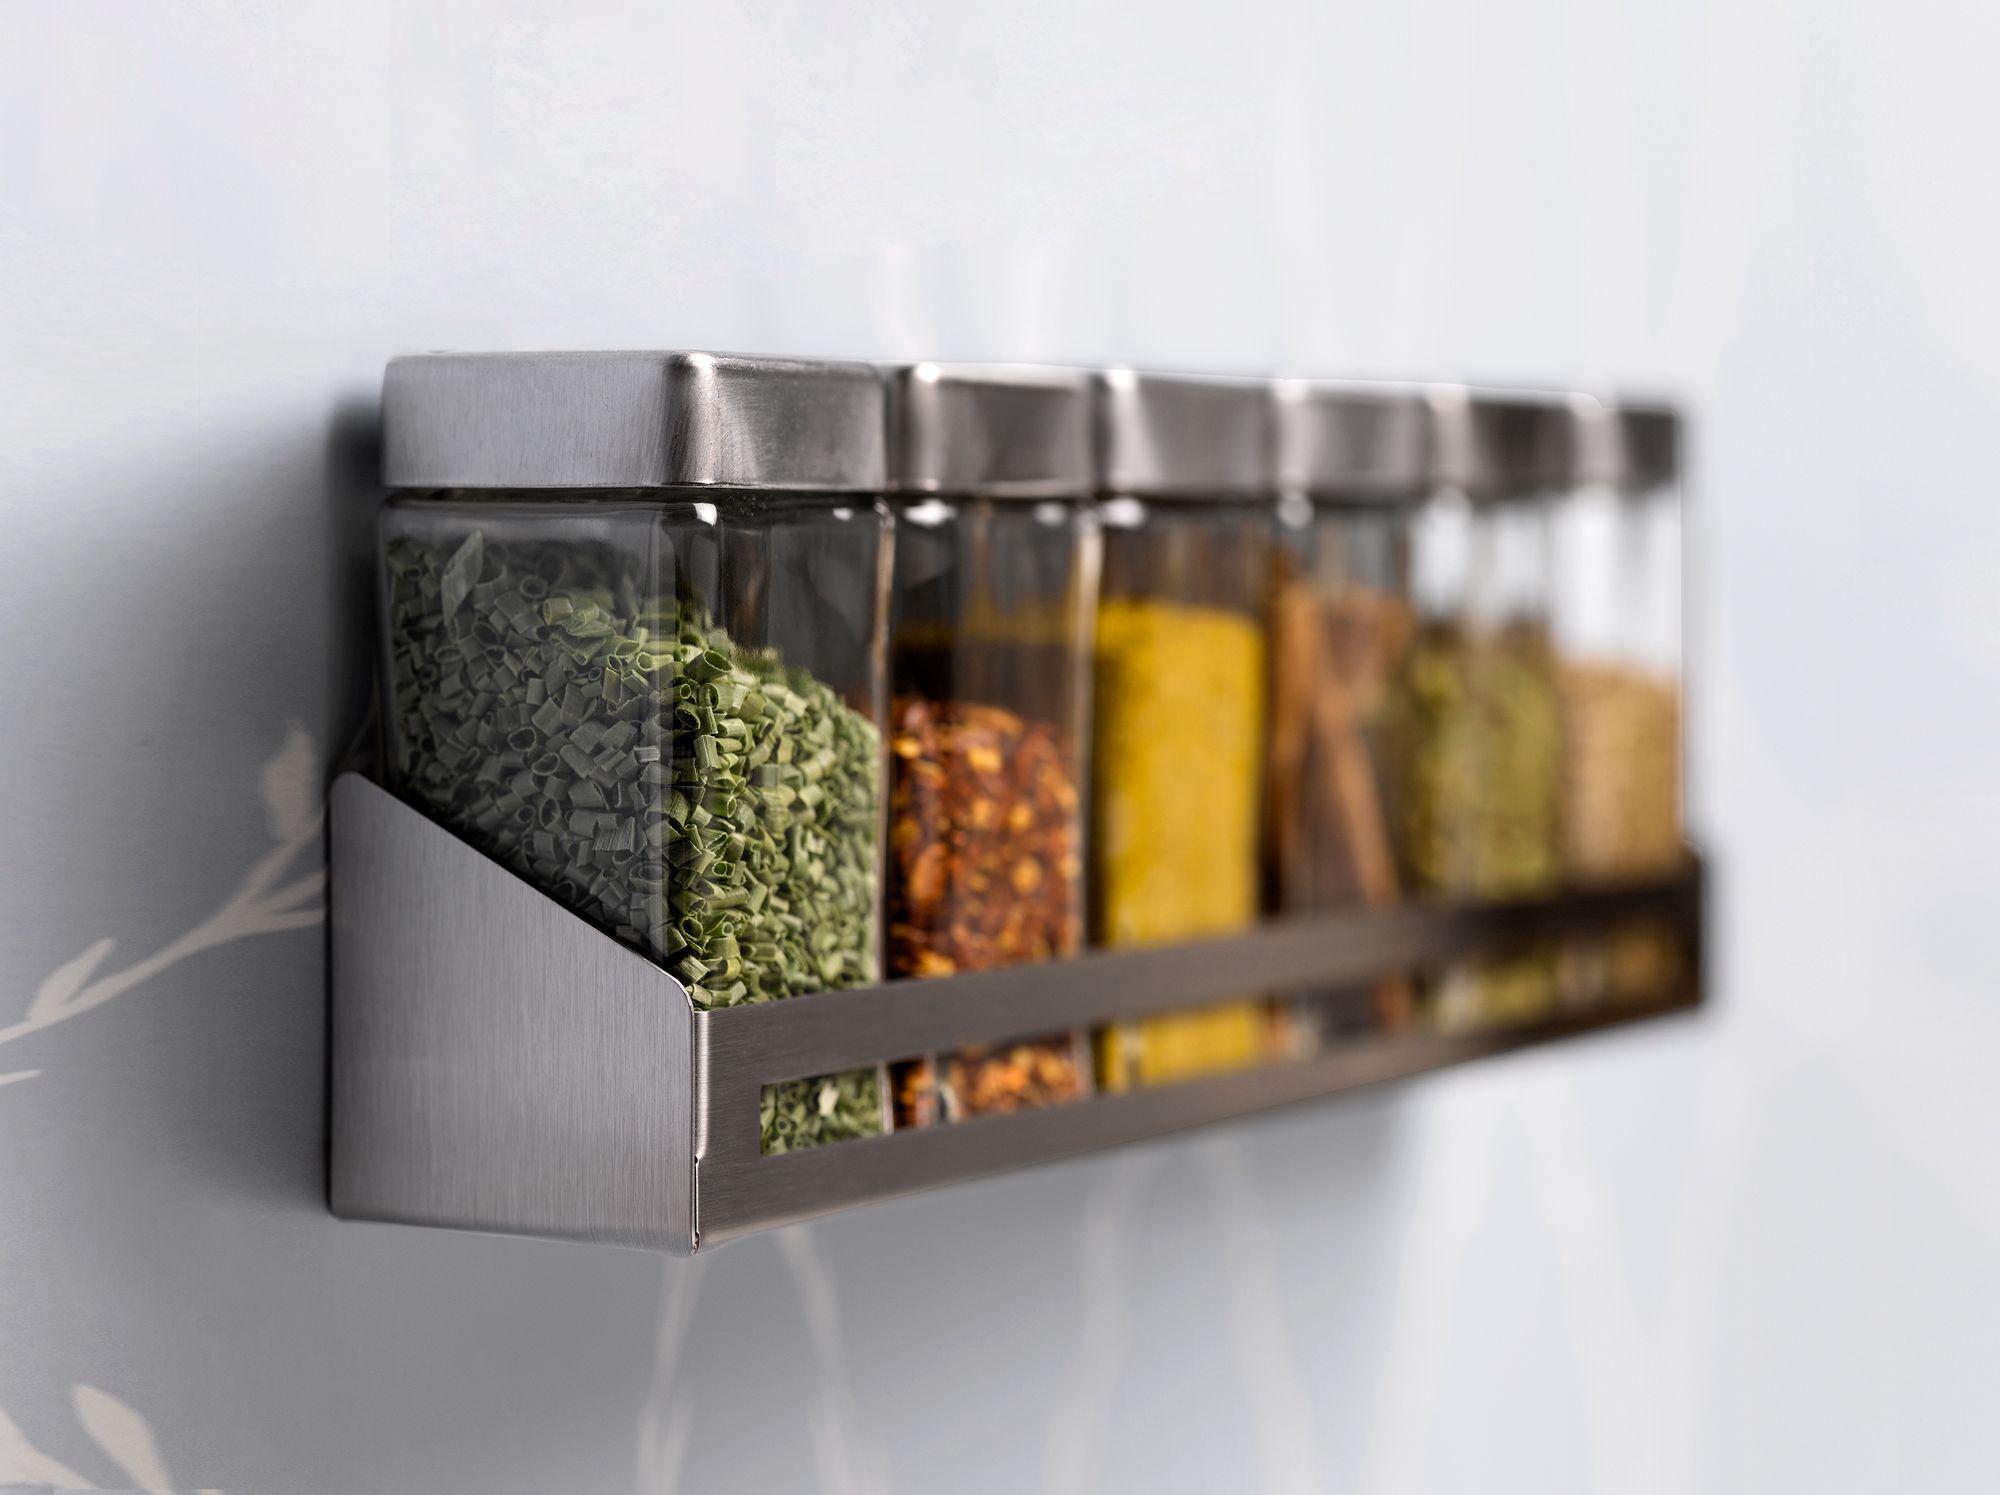 10 Best Spice Racks 2021 - Spice Rack Organizer Recommendations